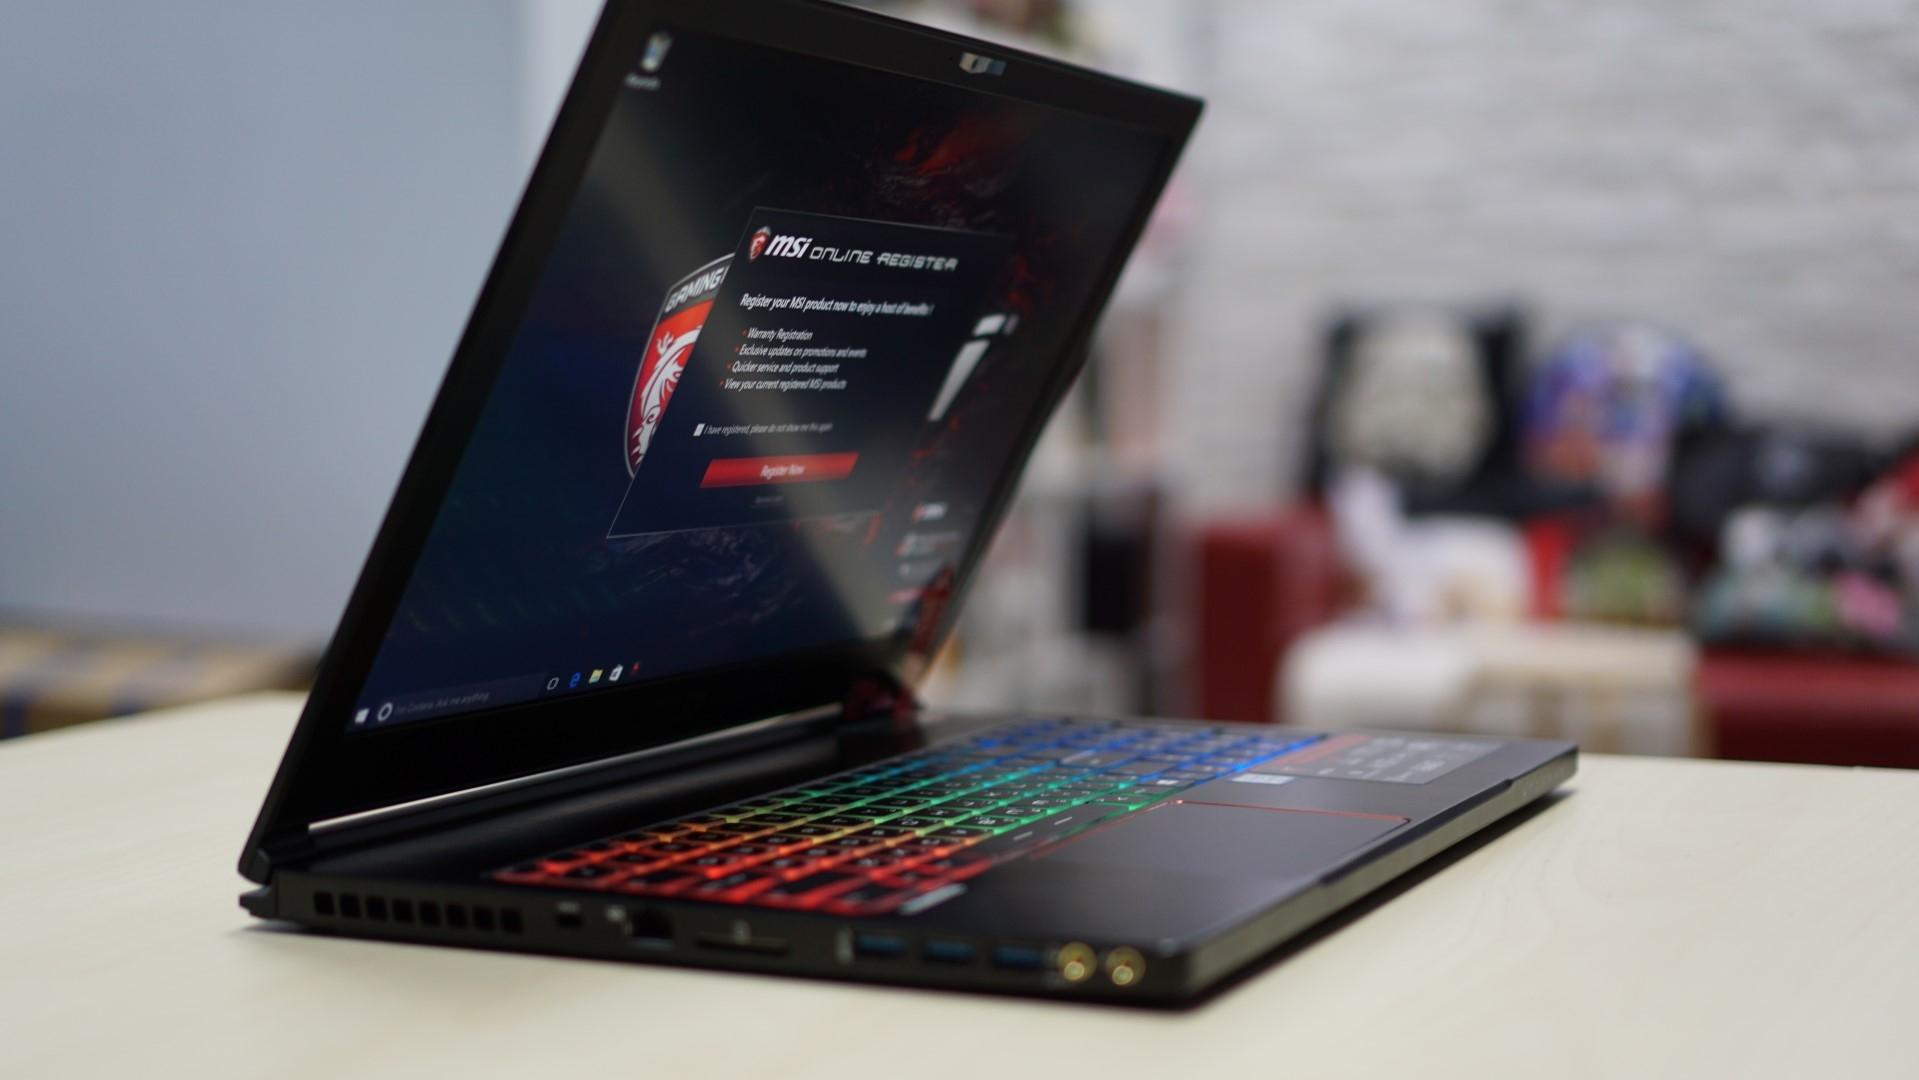 MSI анонсировали тонкие и лёгкие VR-ready ноутбуки